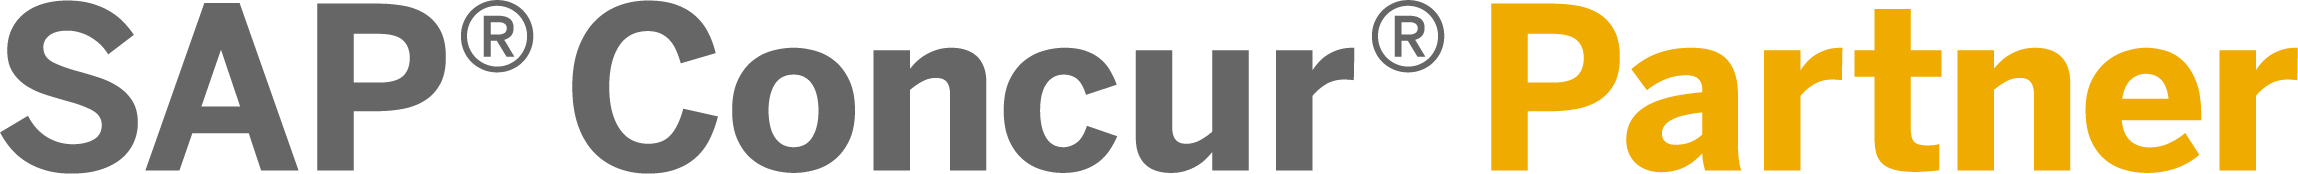 SAP Concur Partner R